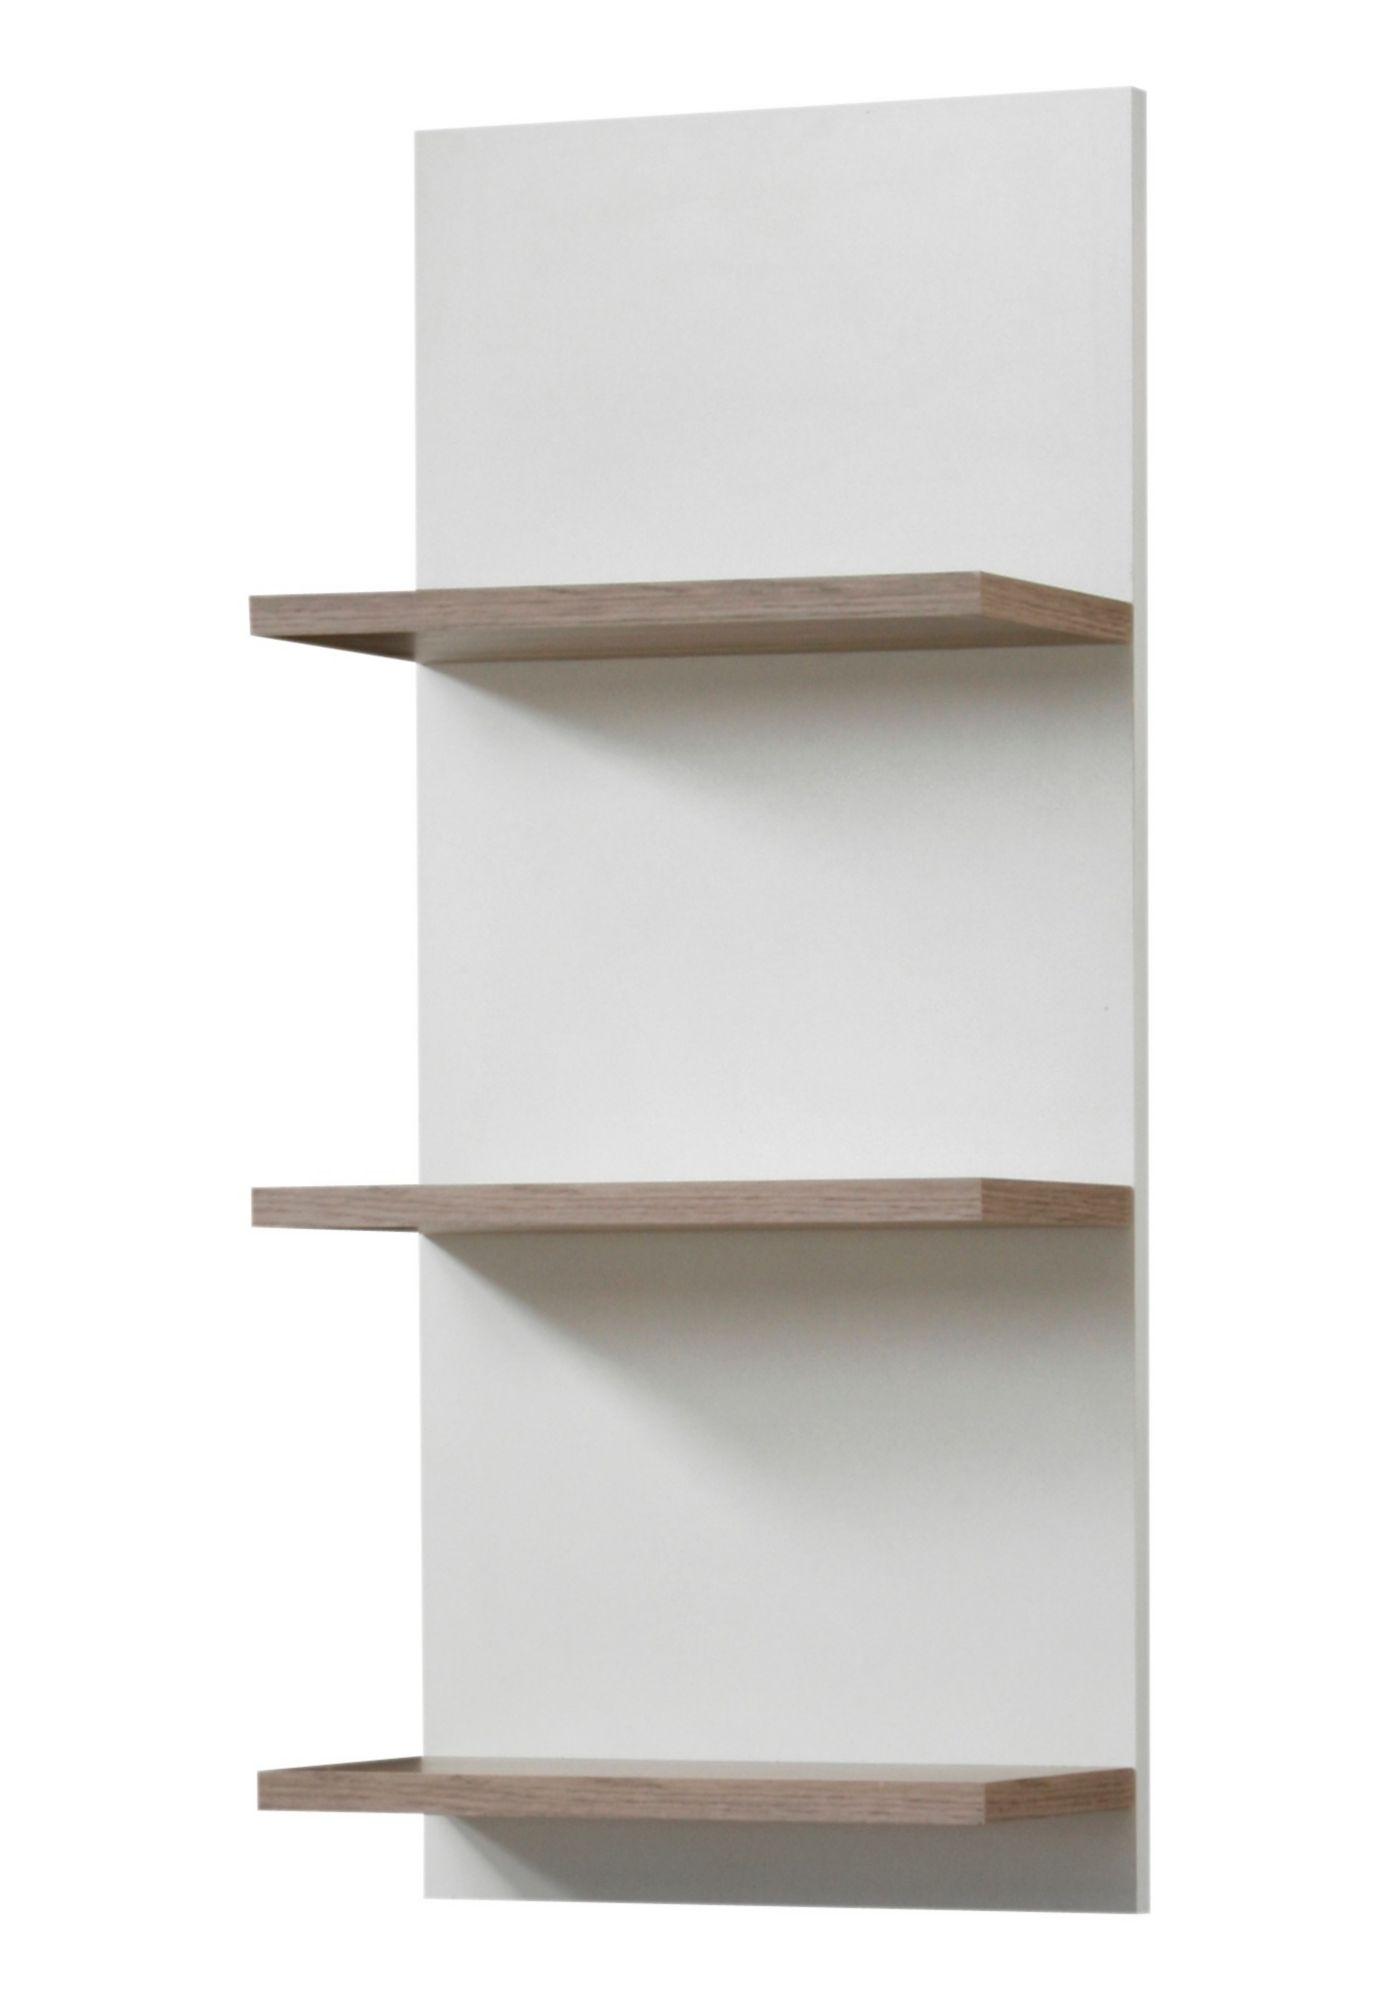 regal cadiz breite 30 cm schwab versand badregale. Black Bedroom Furniture Sets. Home Design Ideas